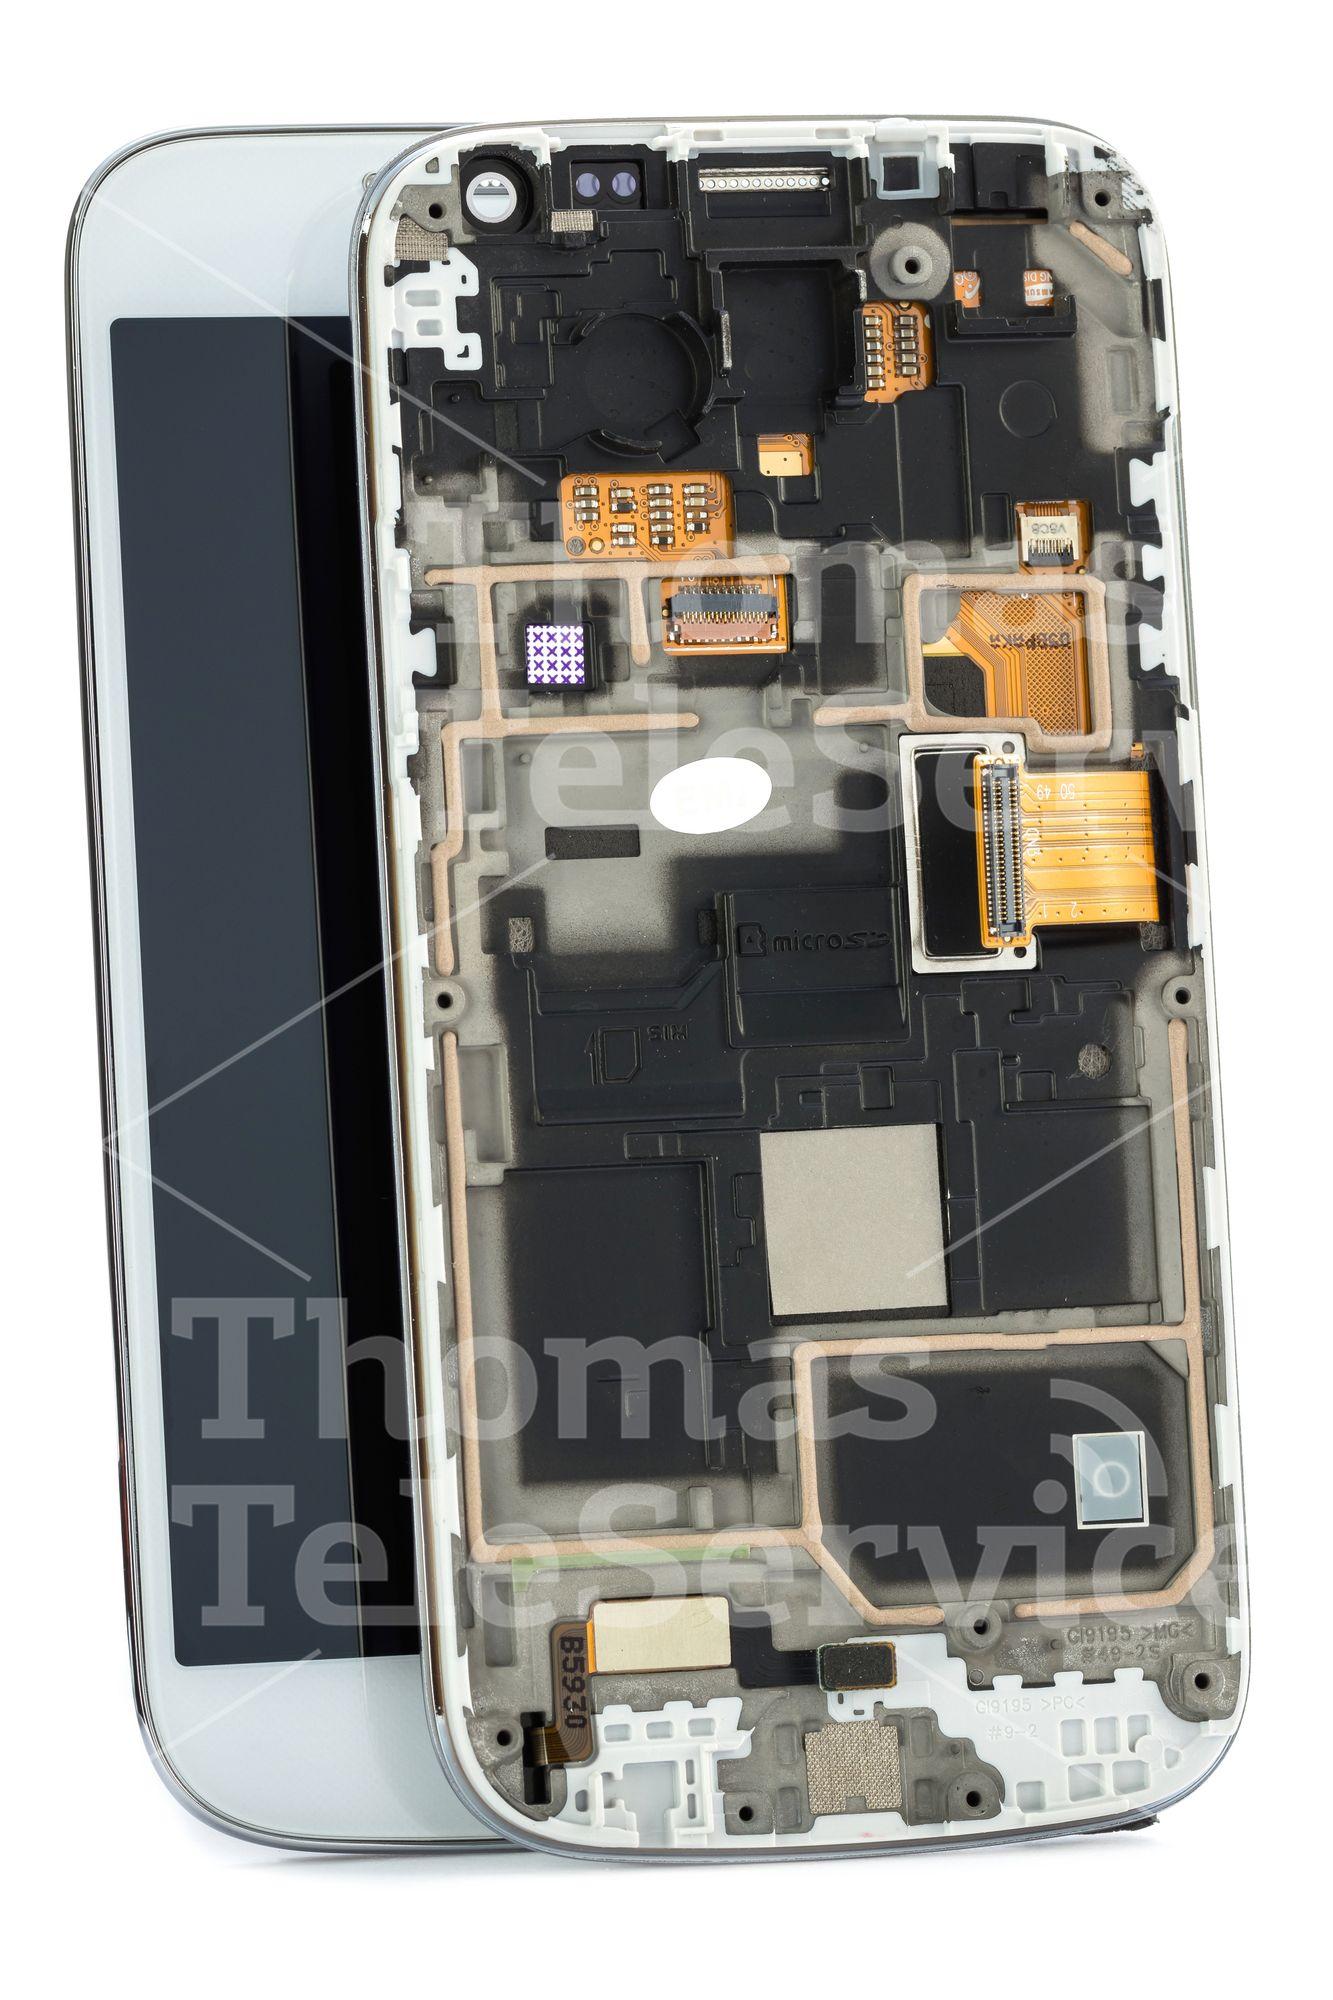 samsung galaxy s4 mini i9195 lcd display touchsreen. Black Bedroom Furniture Sets. Home Design Ideas